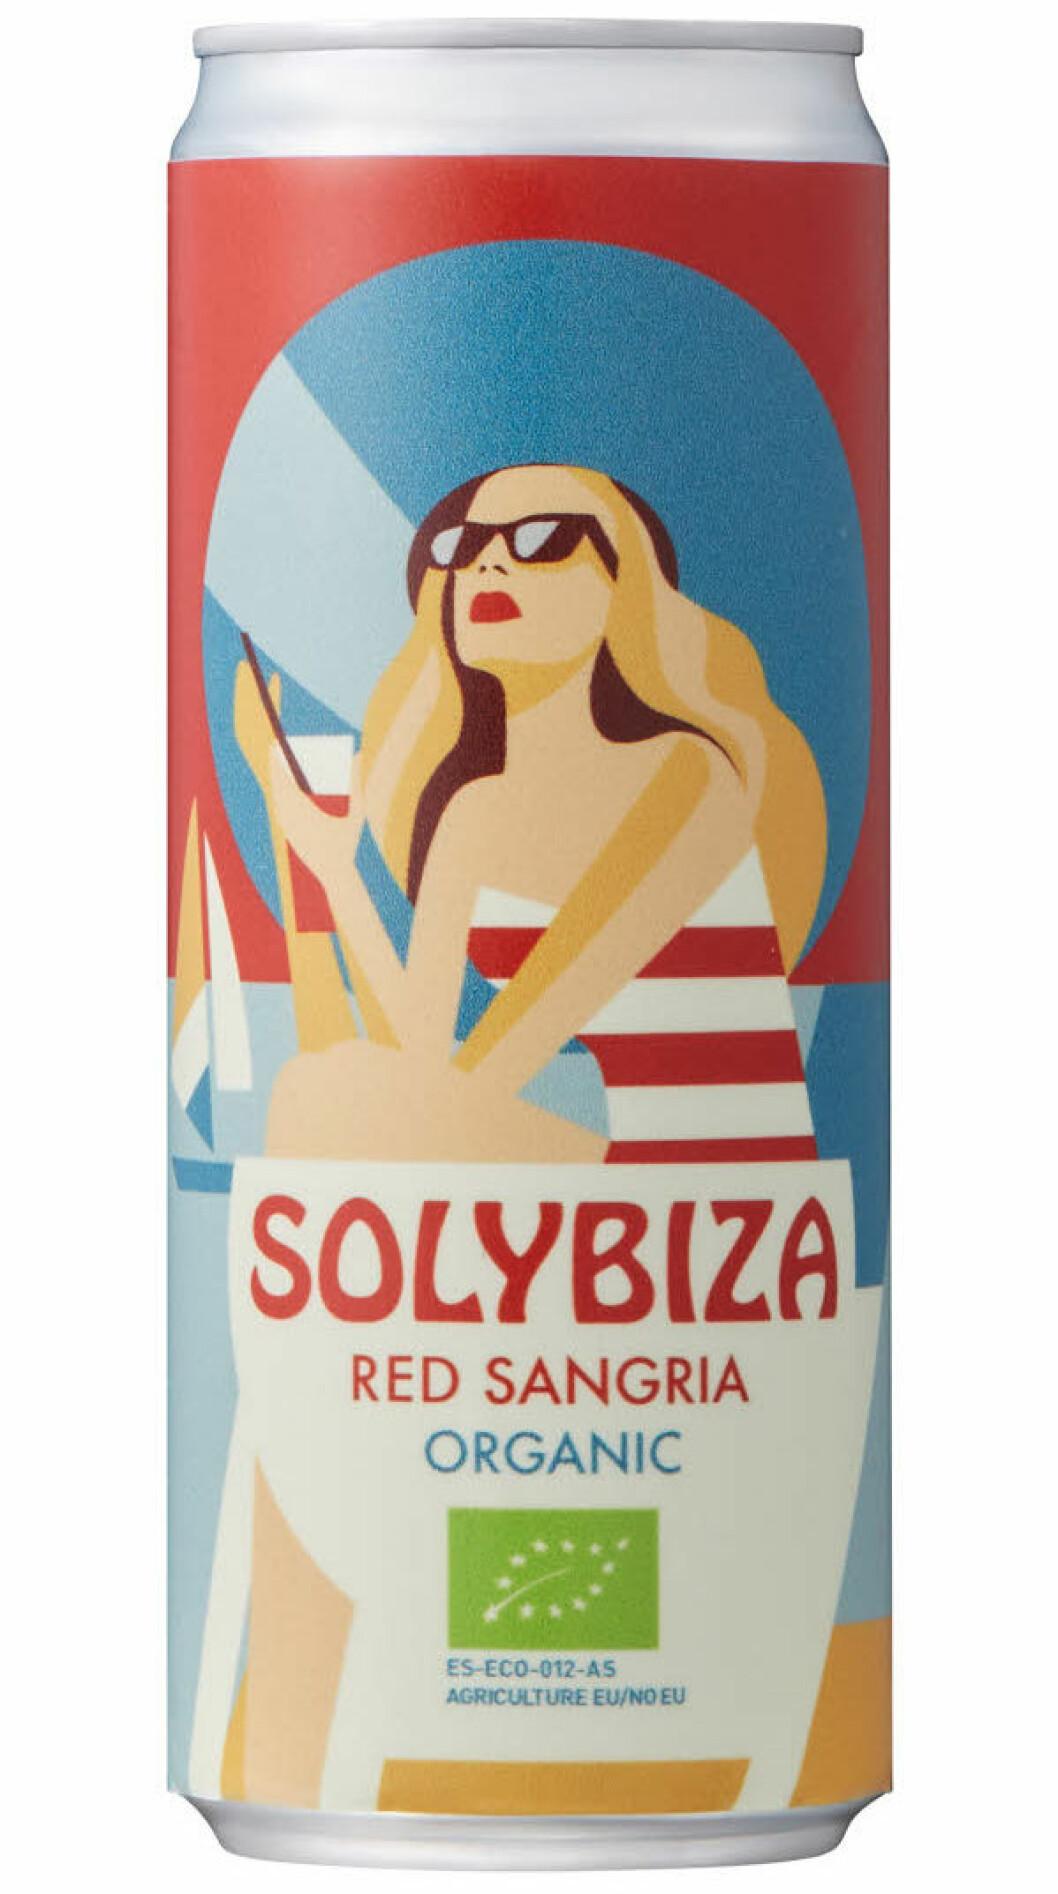 Solybiza Red Sangria Organic